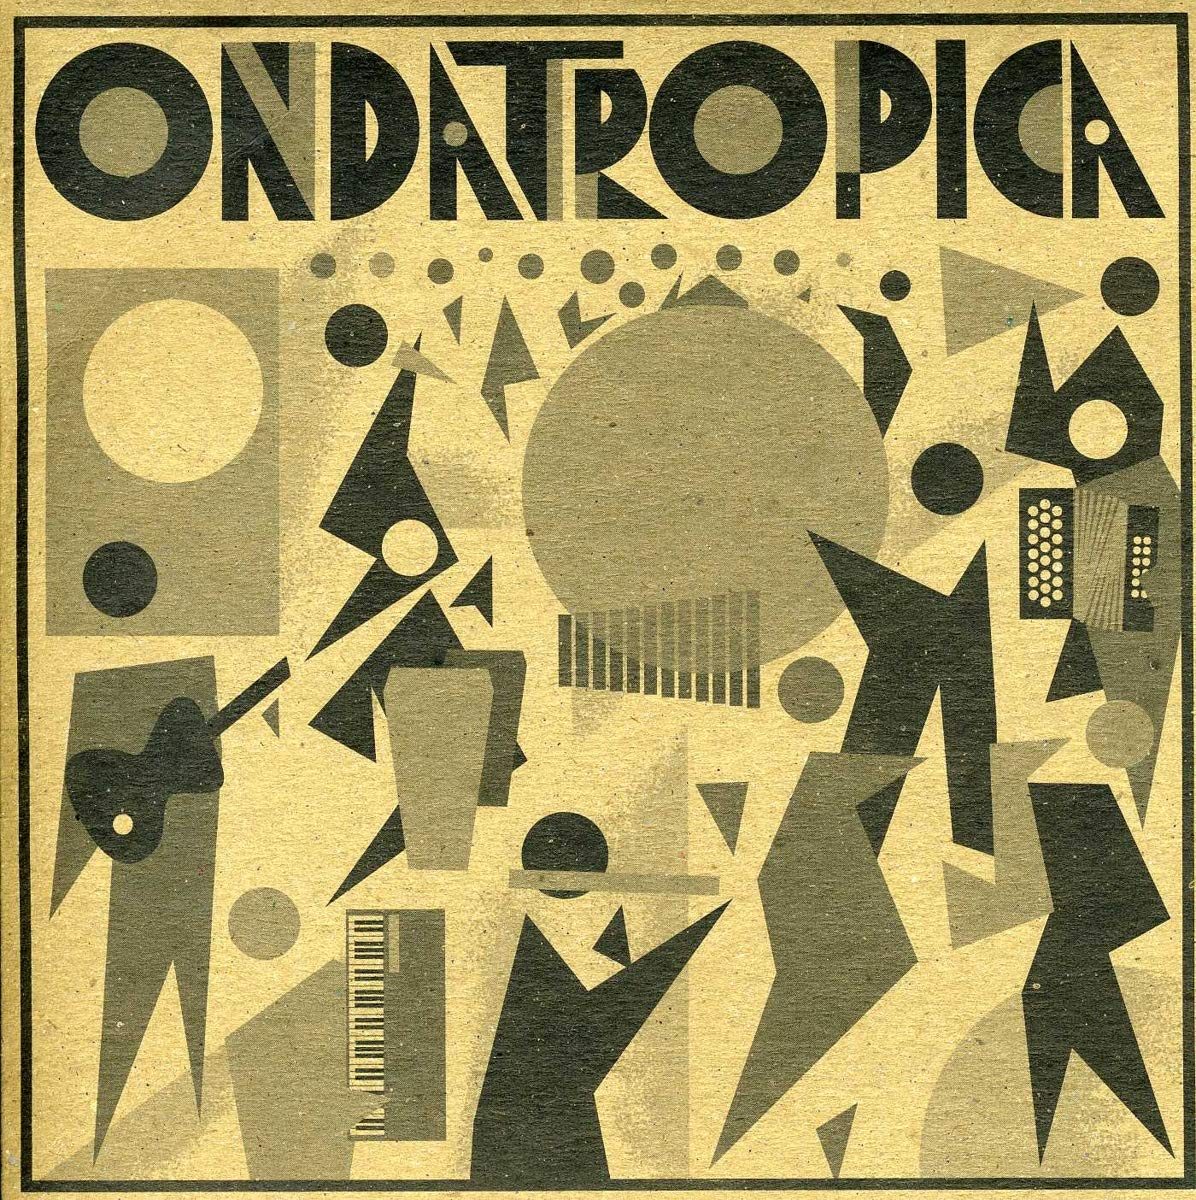 Punkero Sonidero / I Ron Man : Ondatropica: Amazon.es: Música